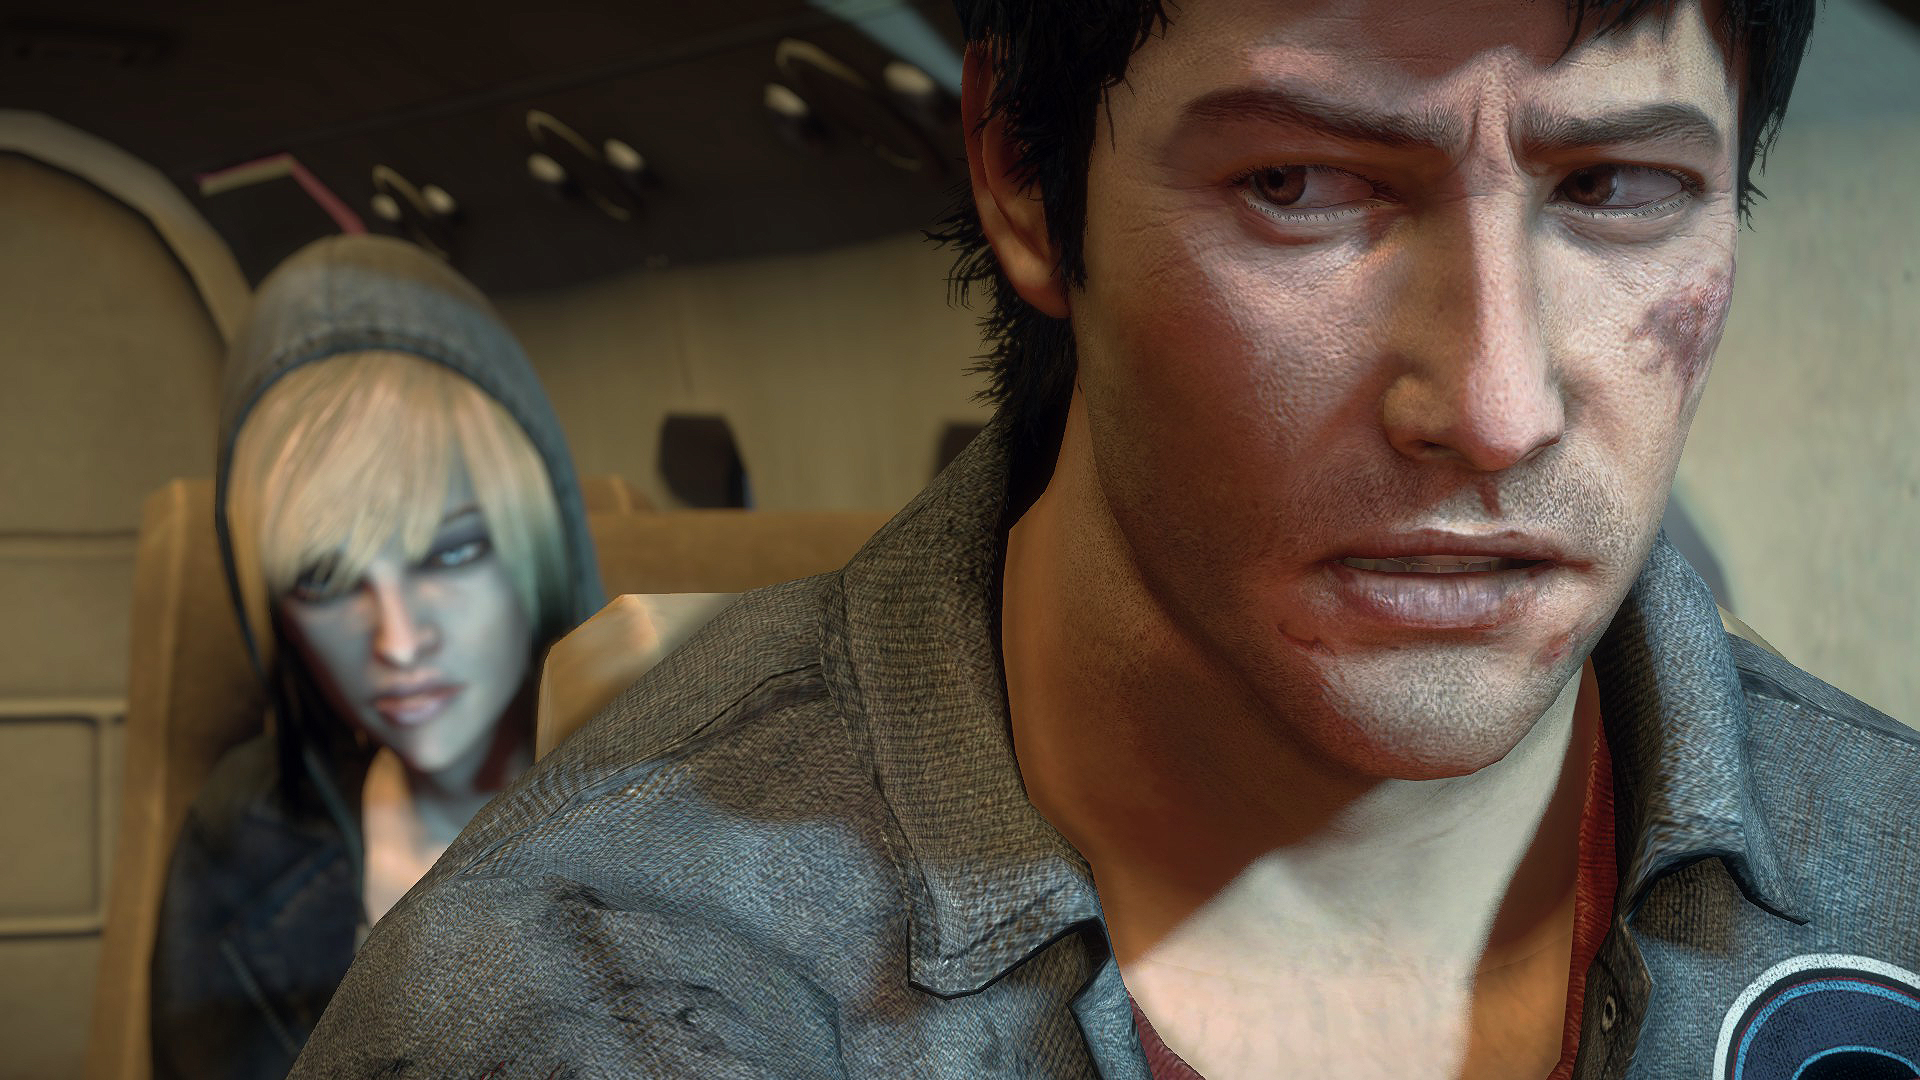 Dead Rising 3 Apocalypse Edition Multilenguaje ESPAÑOL PC (CODEX) Update 1 5